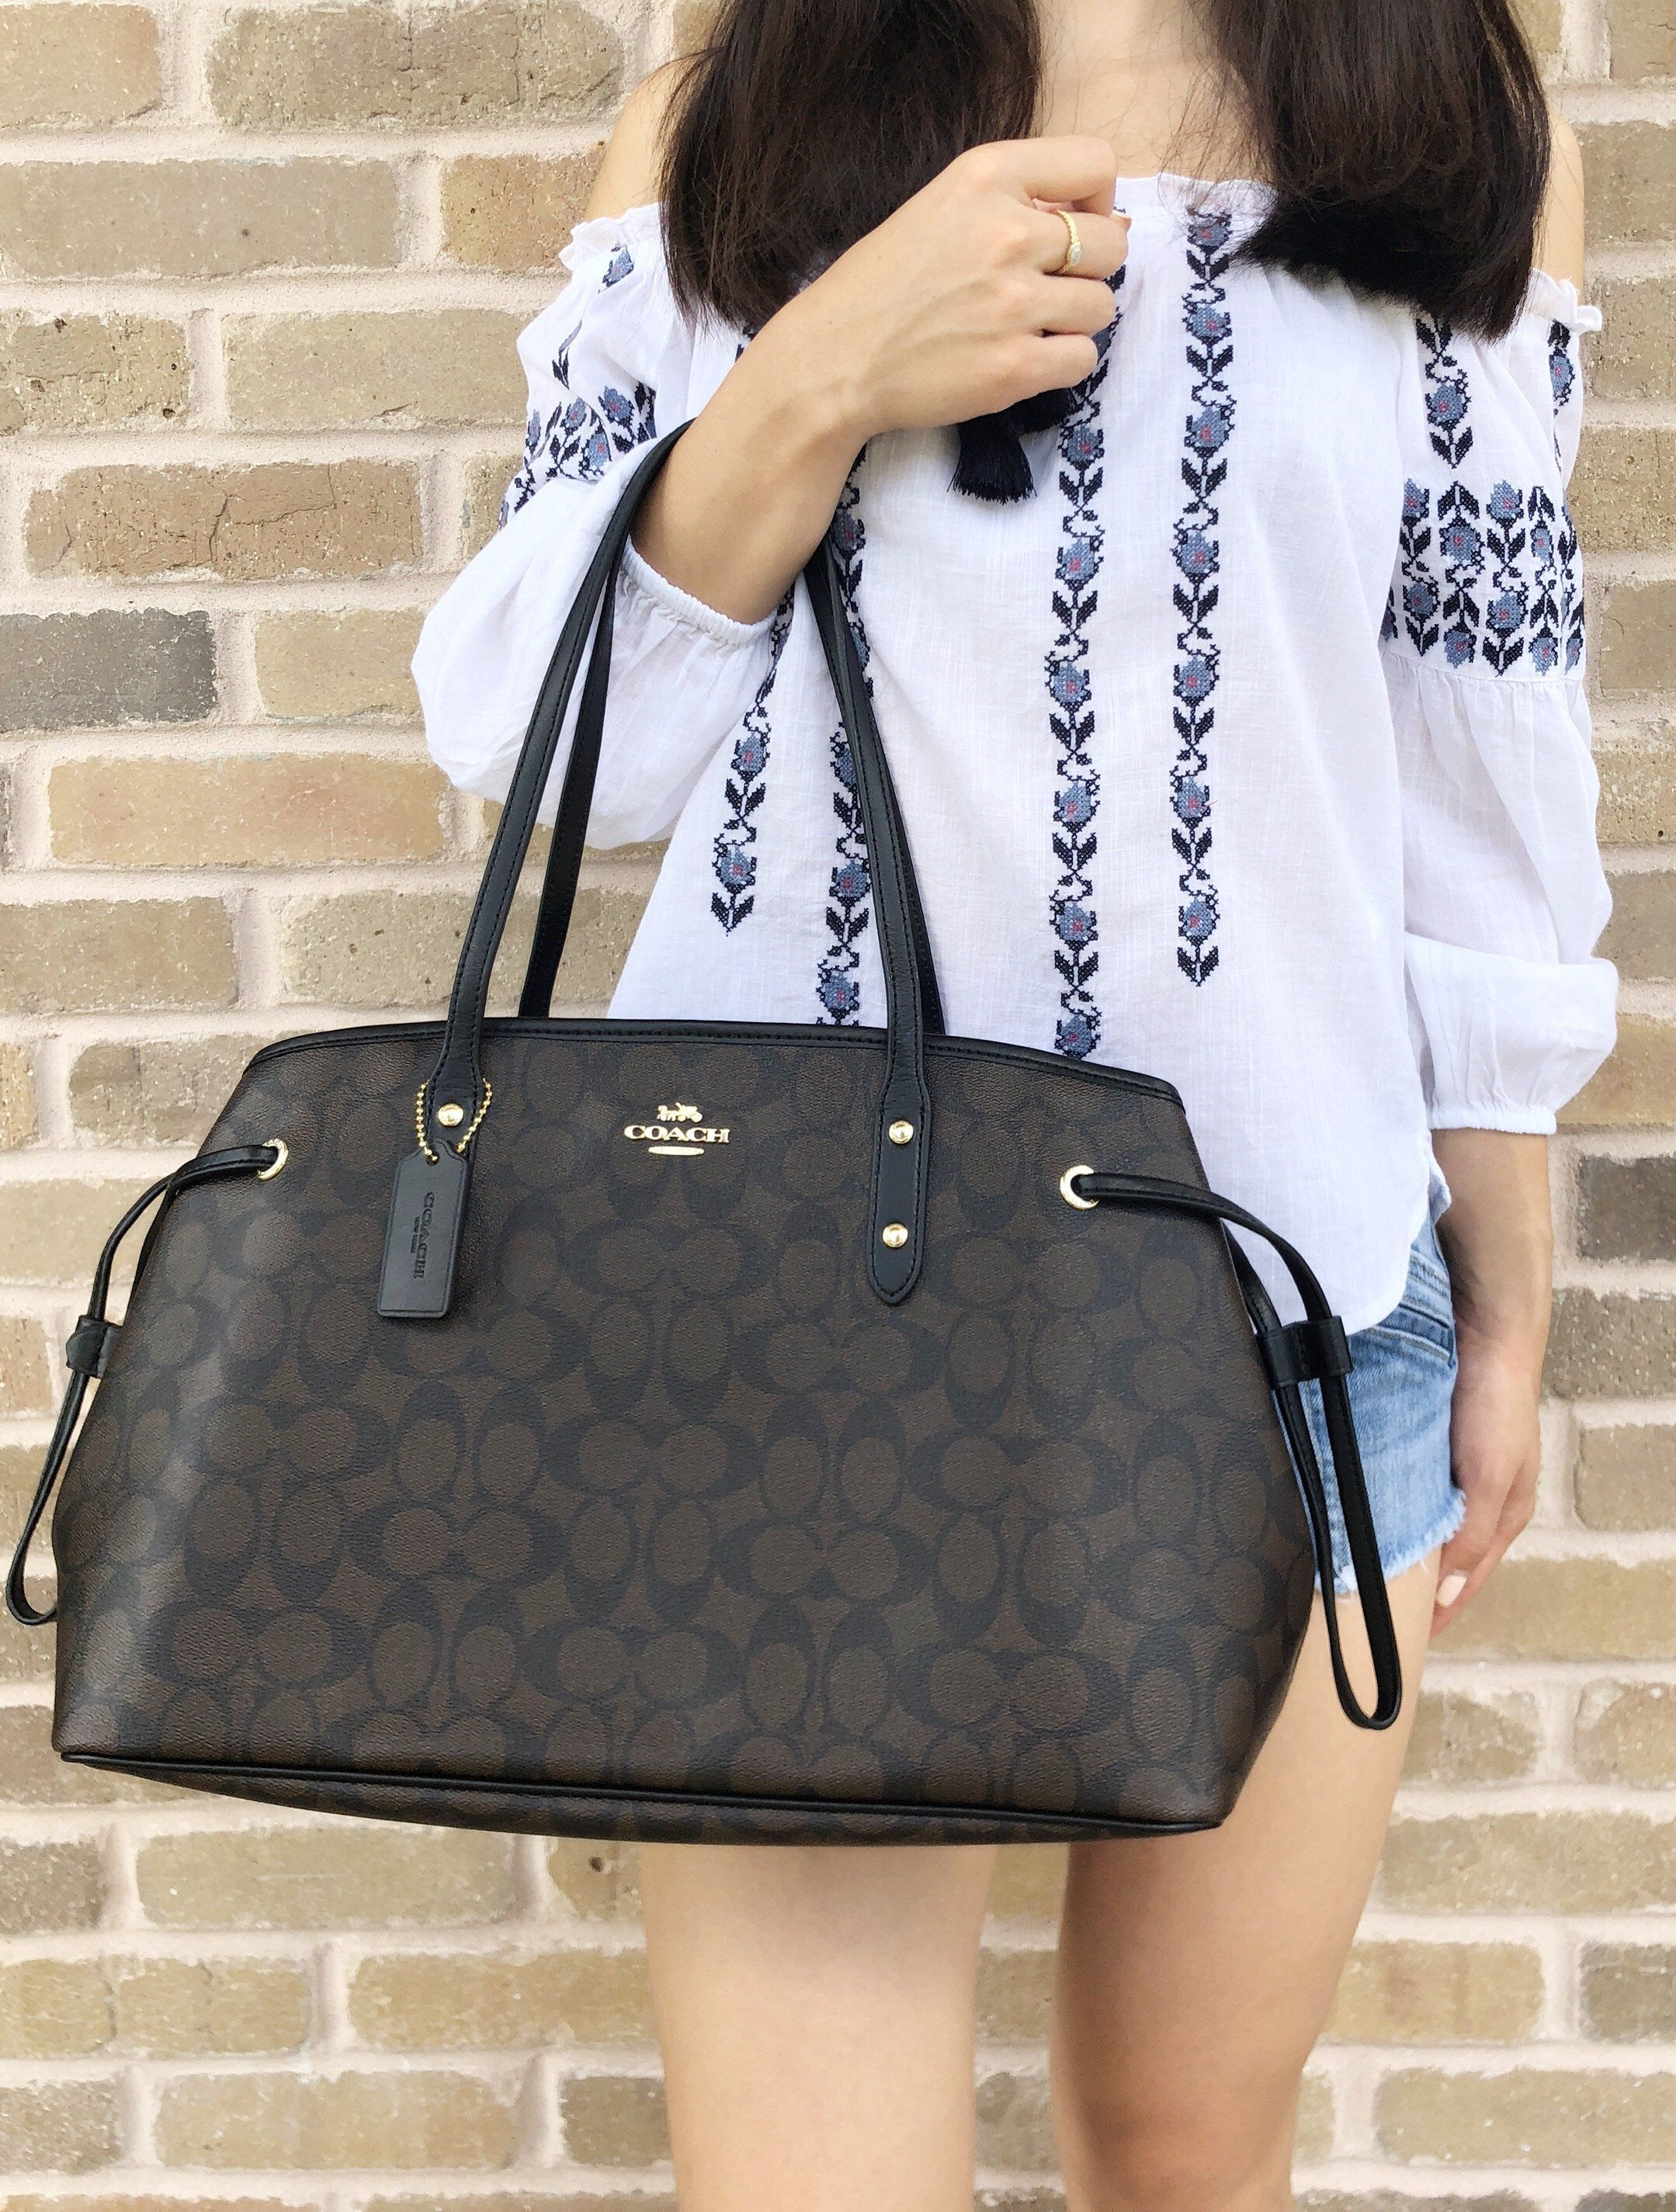 d678d2dd0664 ... greece coach f57842 signature pvc drawstring carryall tote brown black large  handbag amazon topratedseller mercariapp ebay